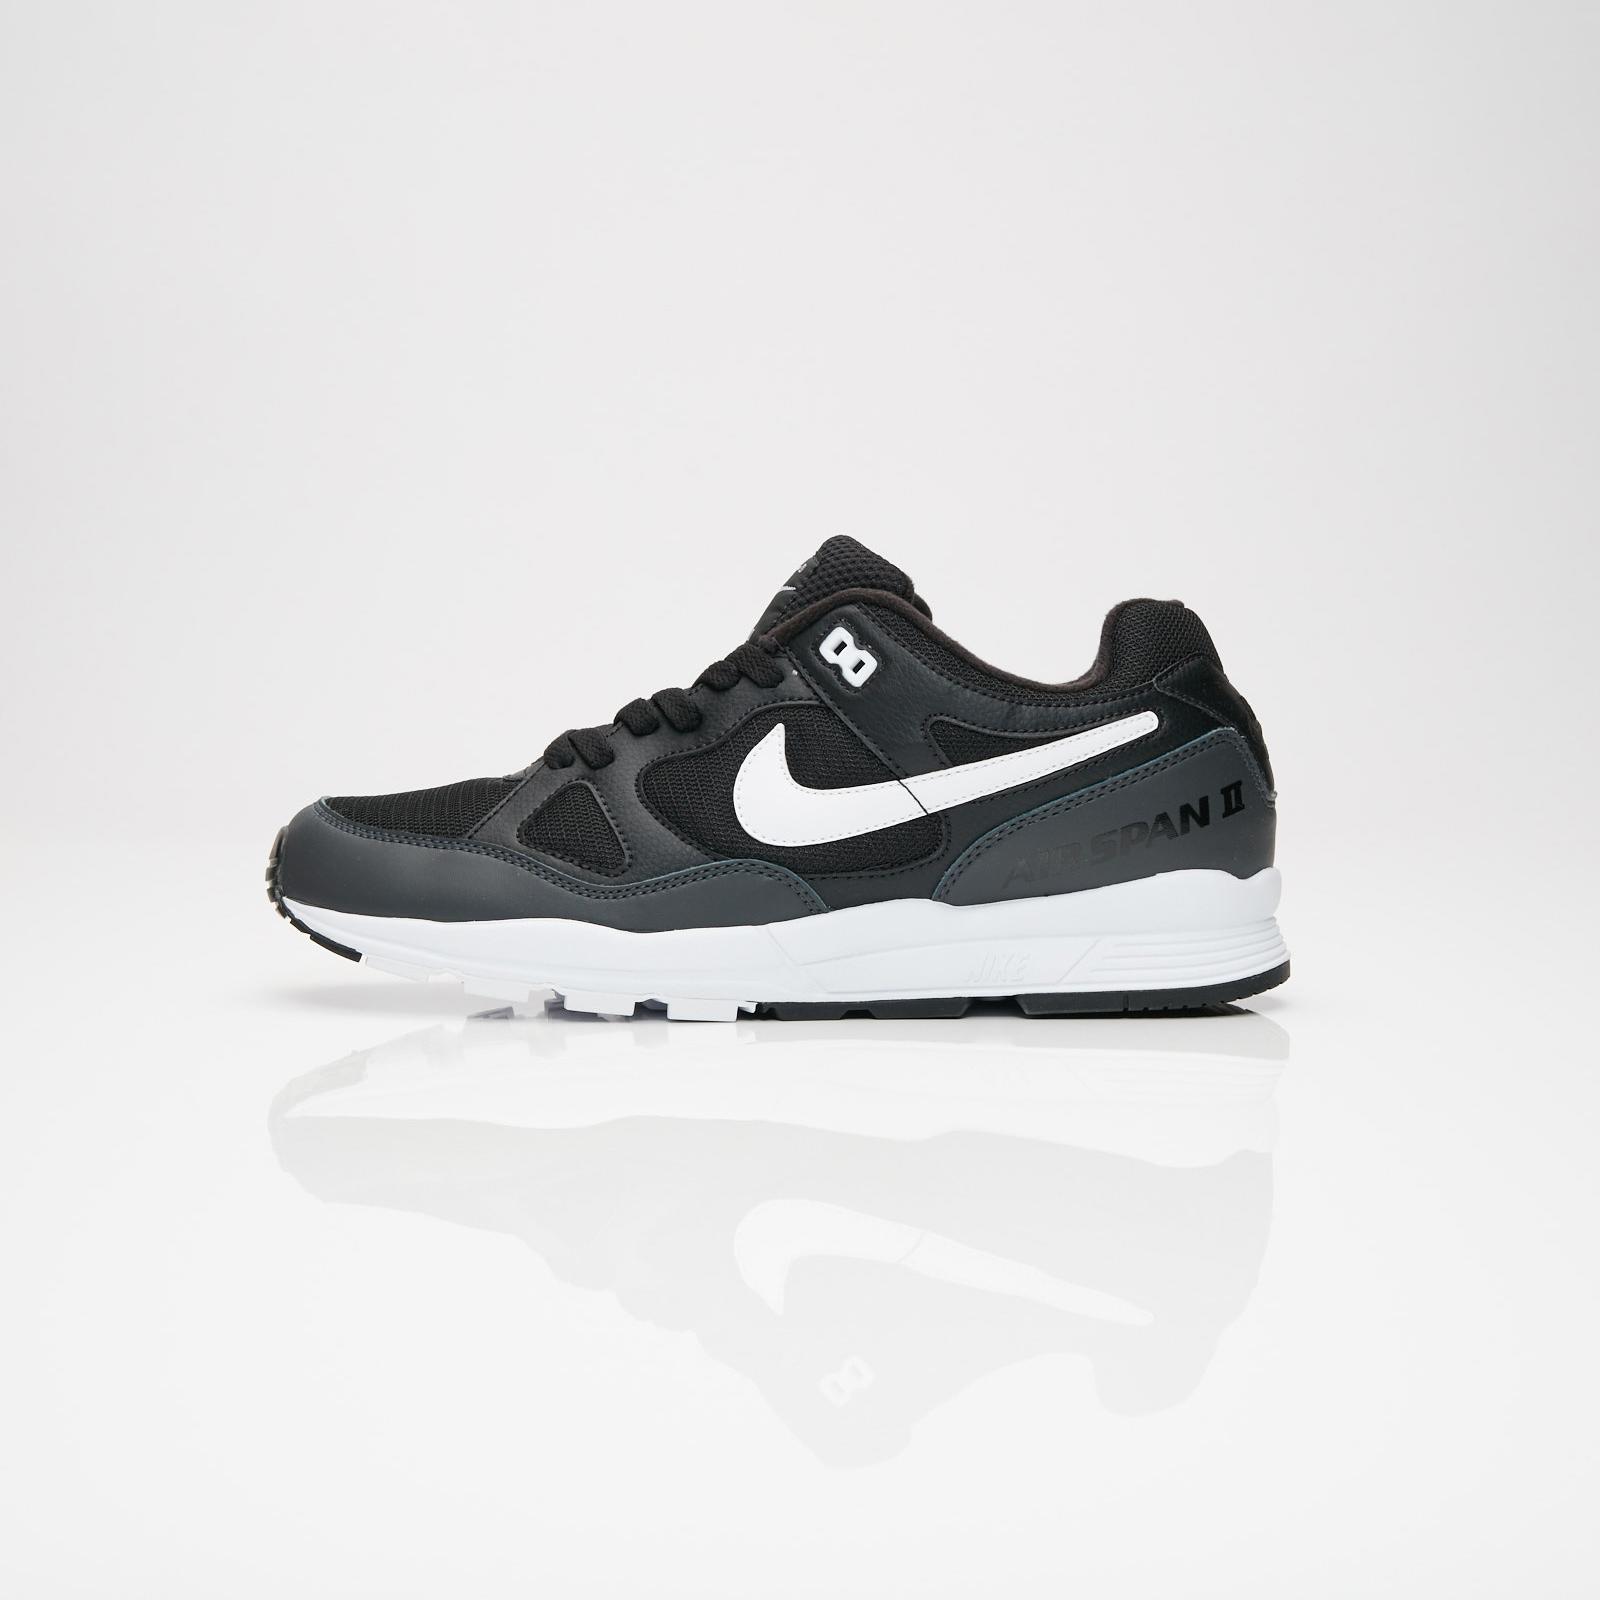 buy popular 52424 82086 ... Nike Sportswear Air Span II ...